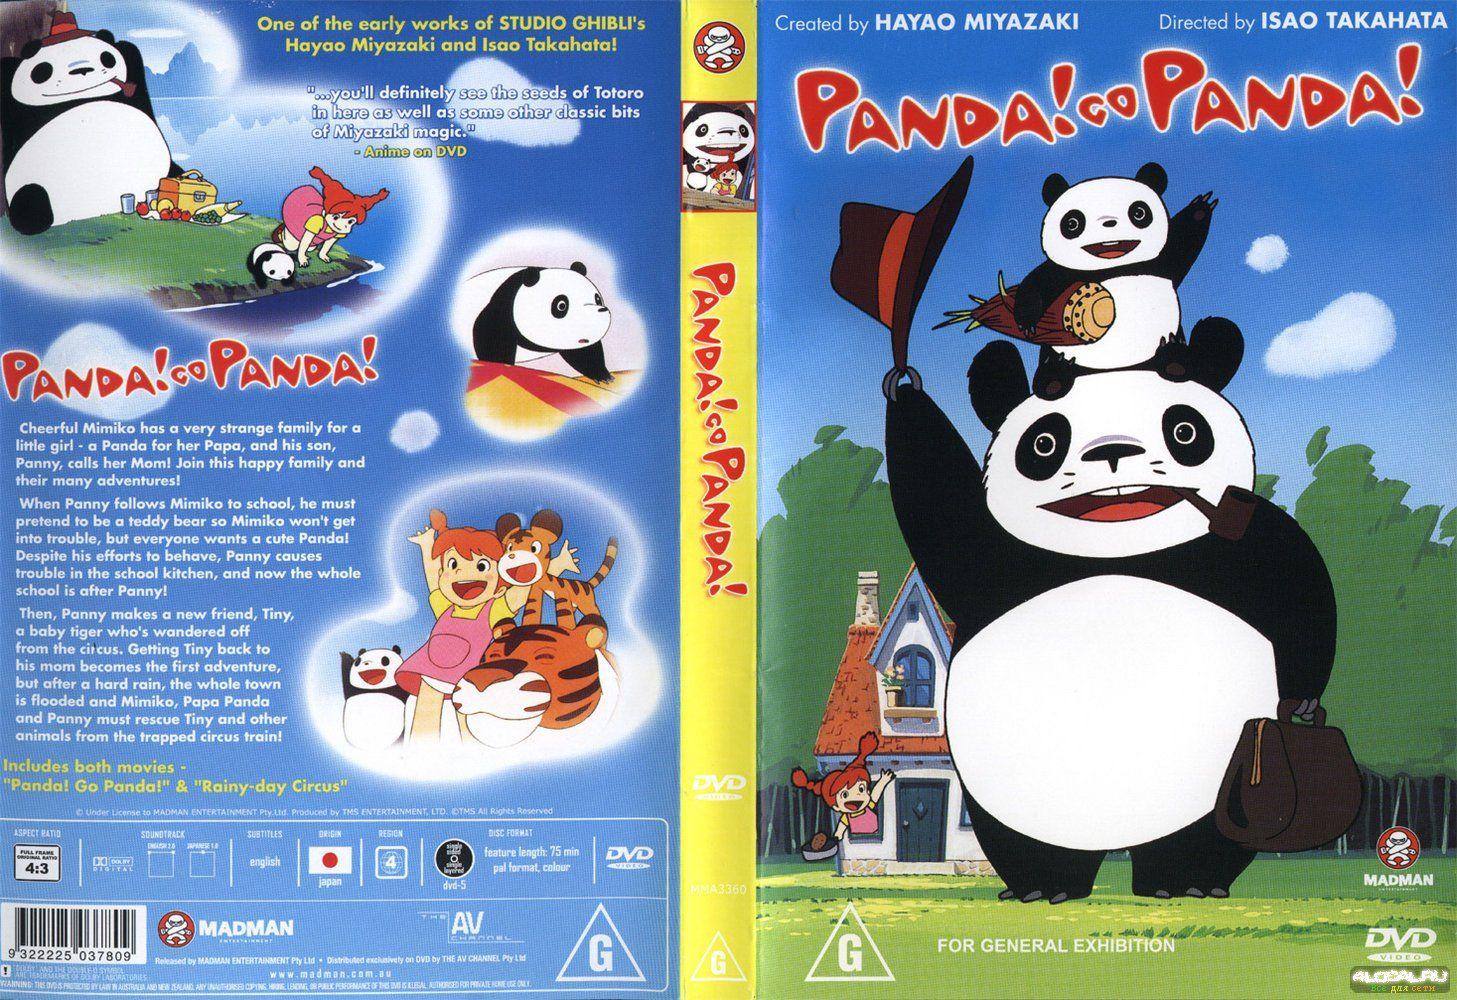 Panda a Mala Panda  / Panda  Kopanda/Panda! Go Panda! (1973)